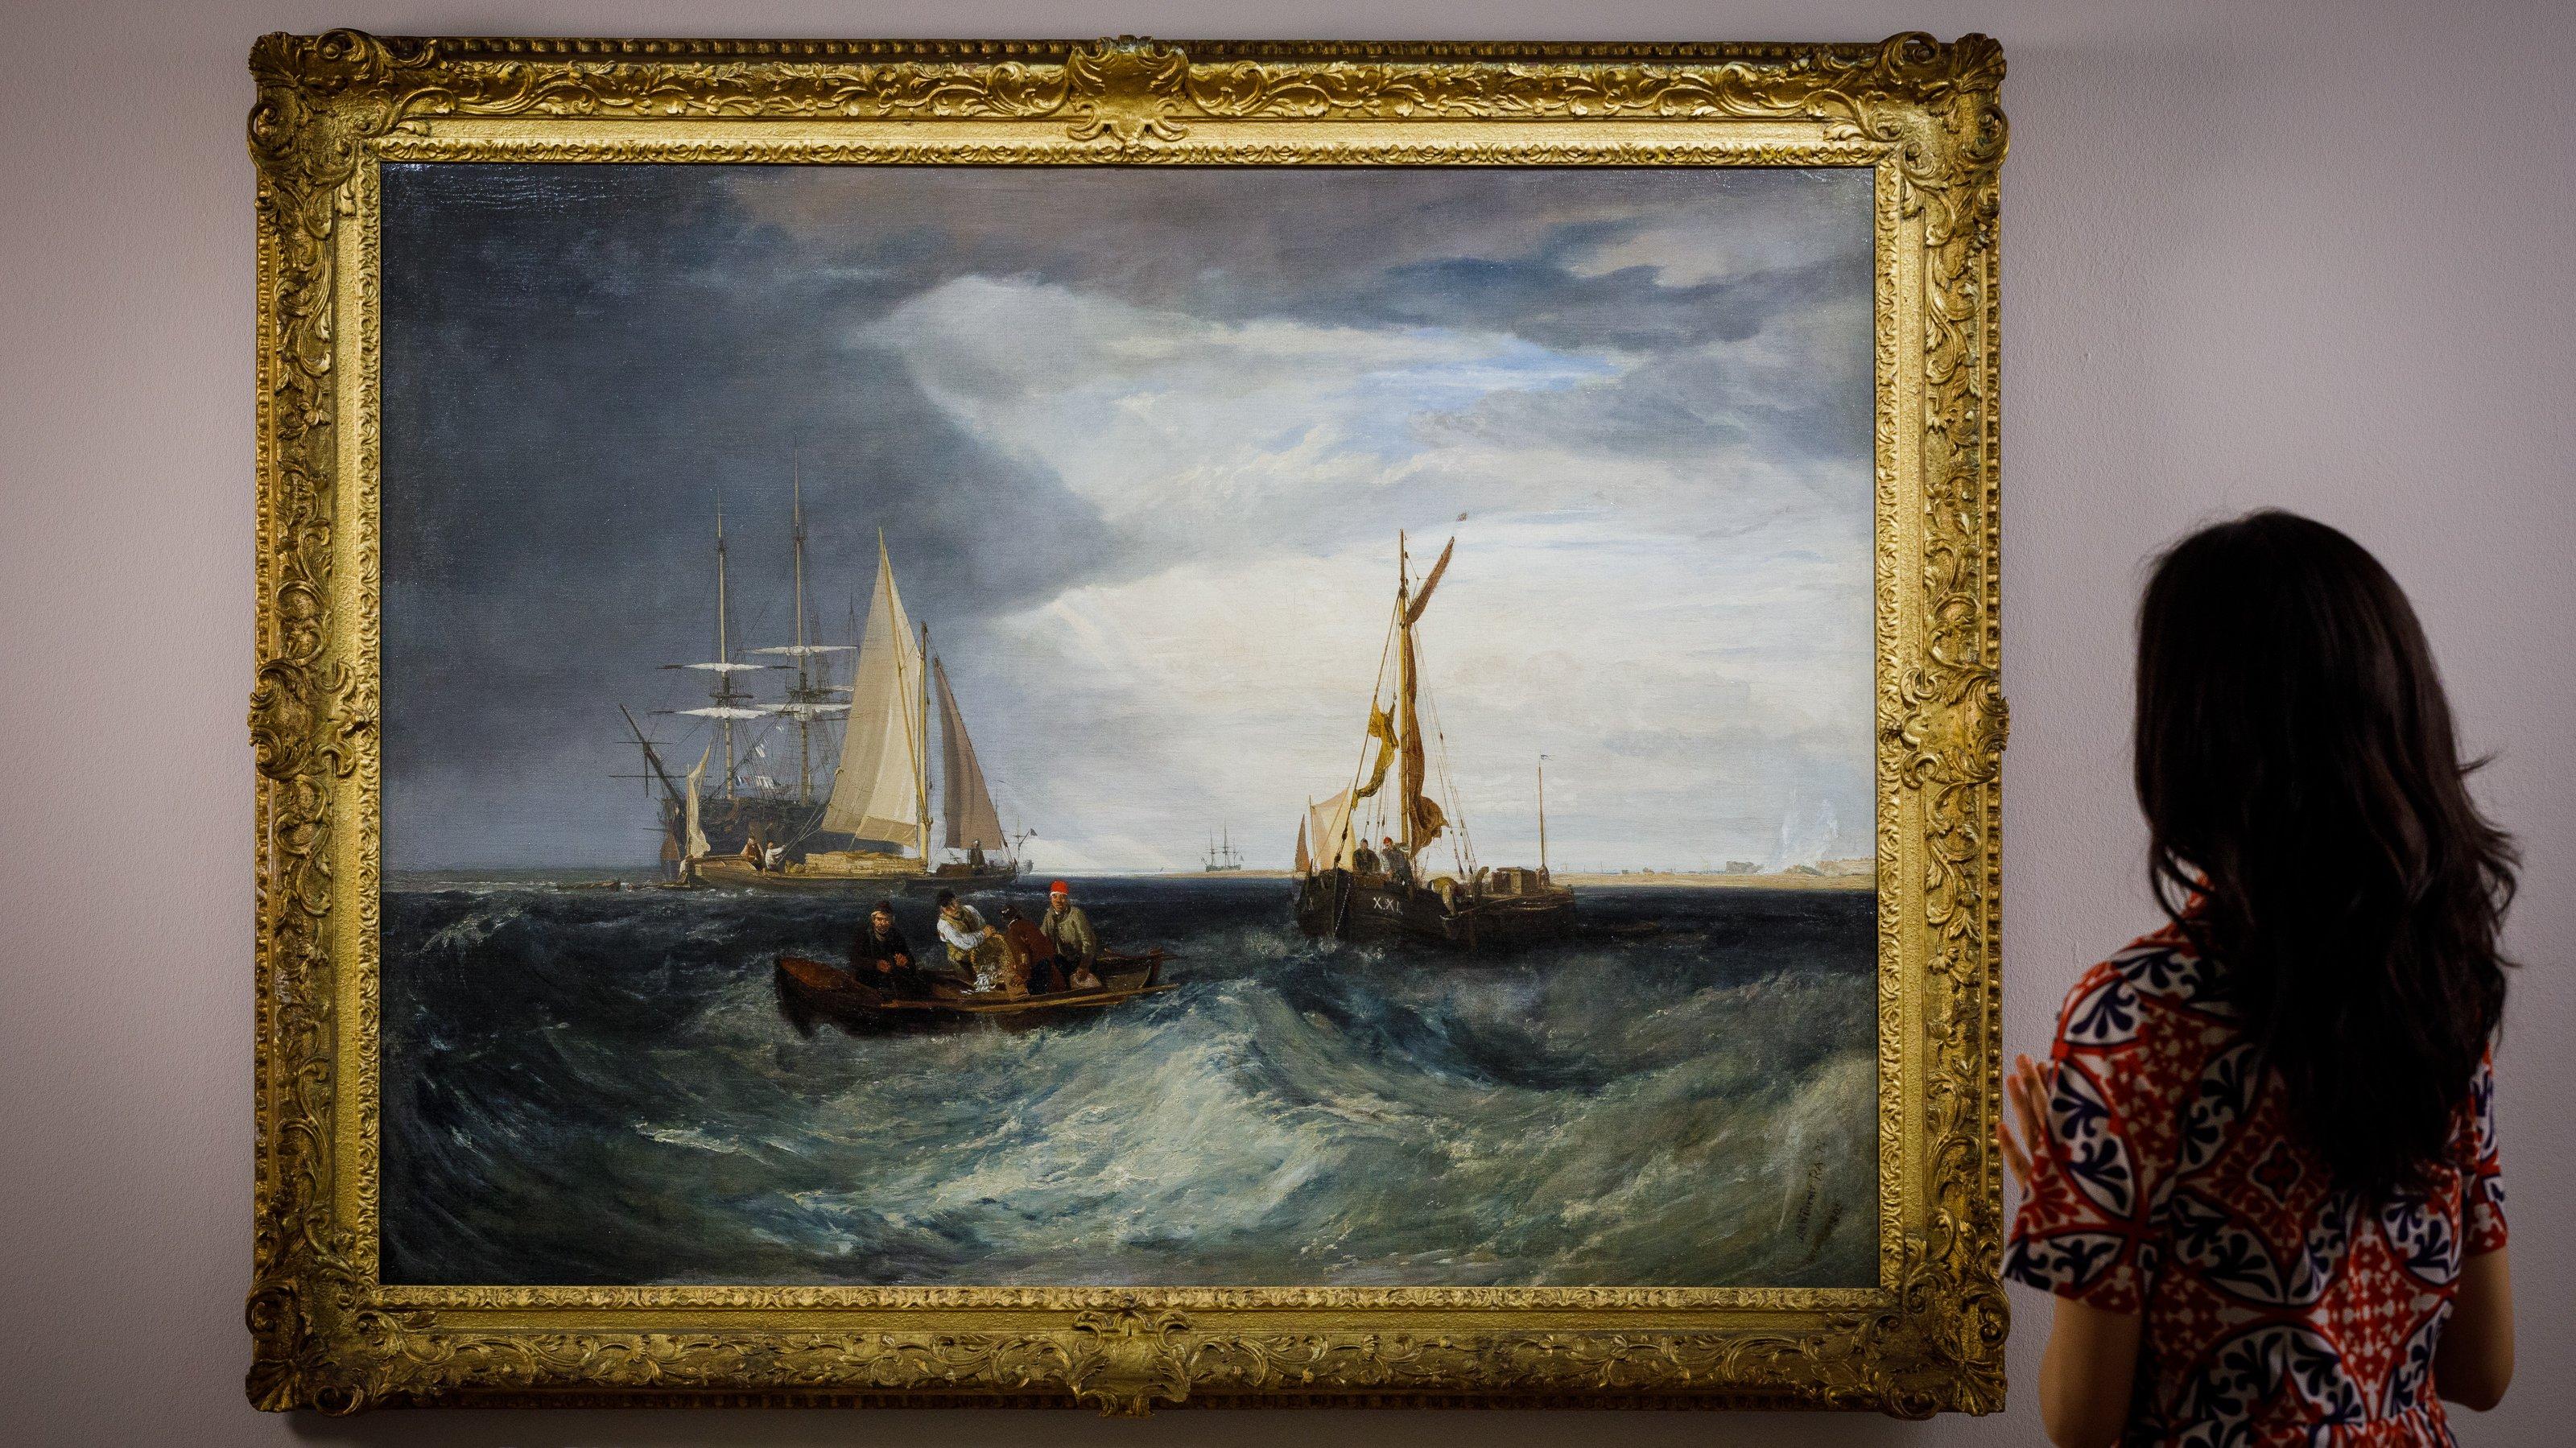 Sotheby's Old Master Paintings & Drawings, plus Treasures